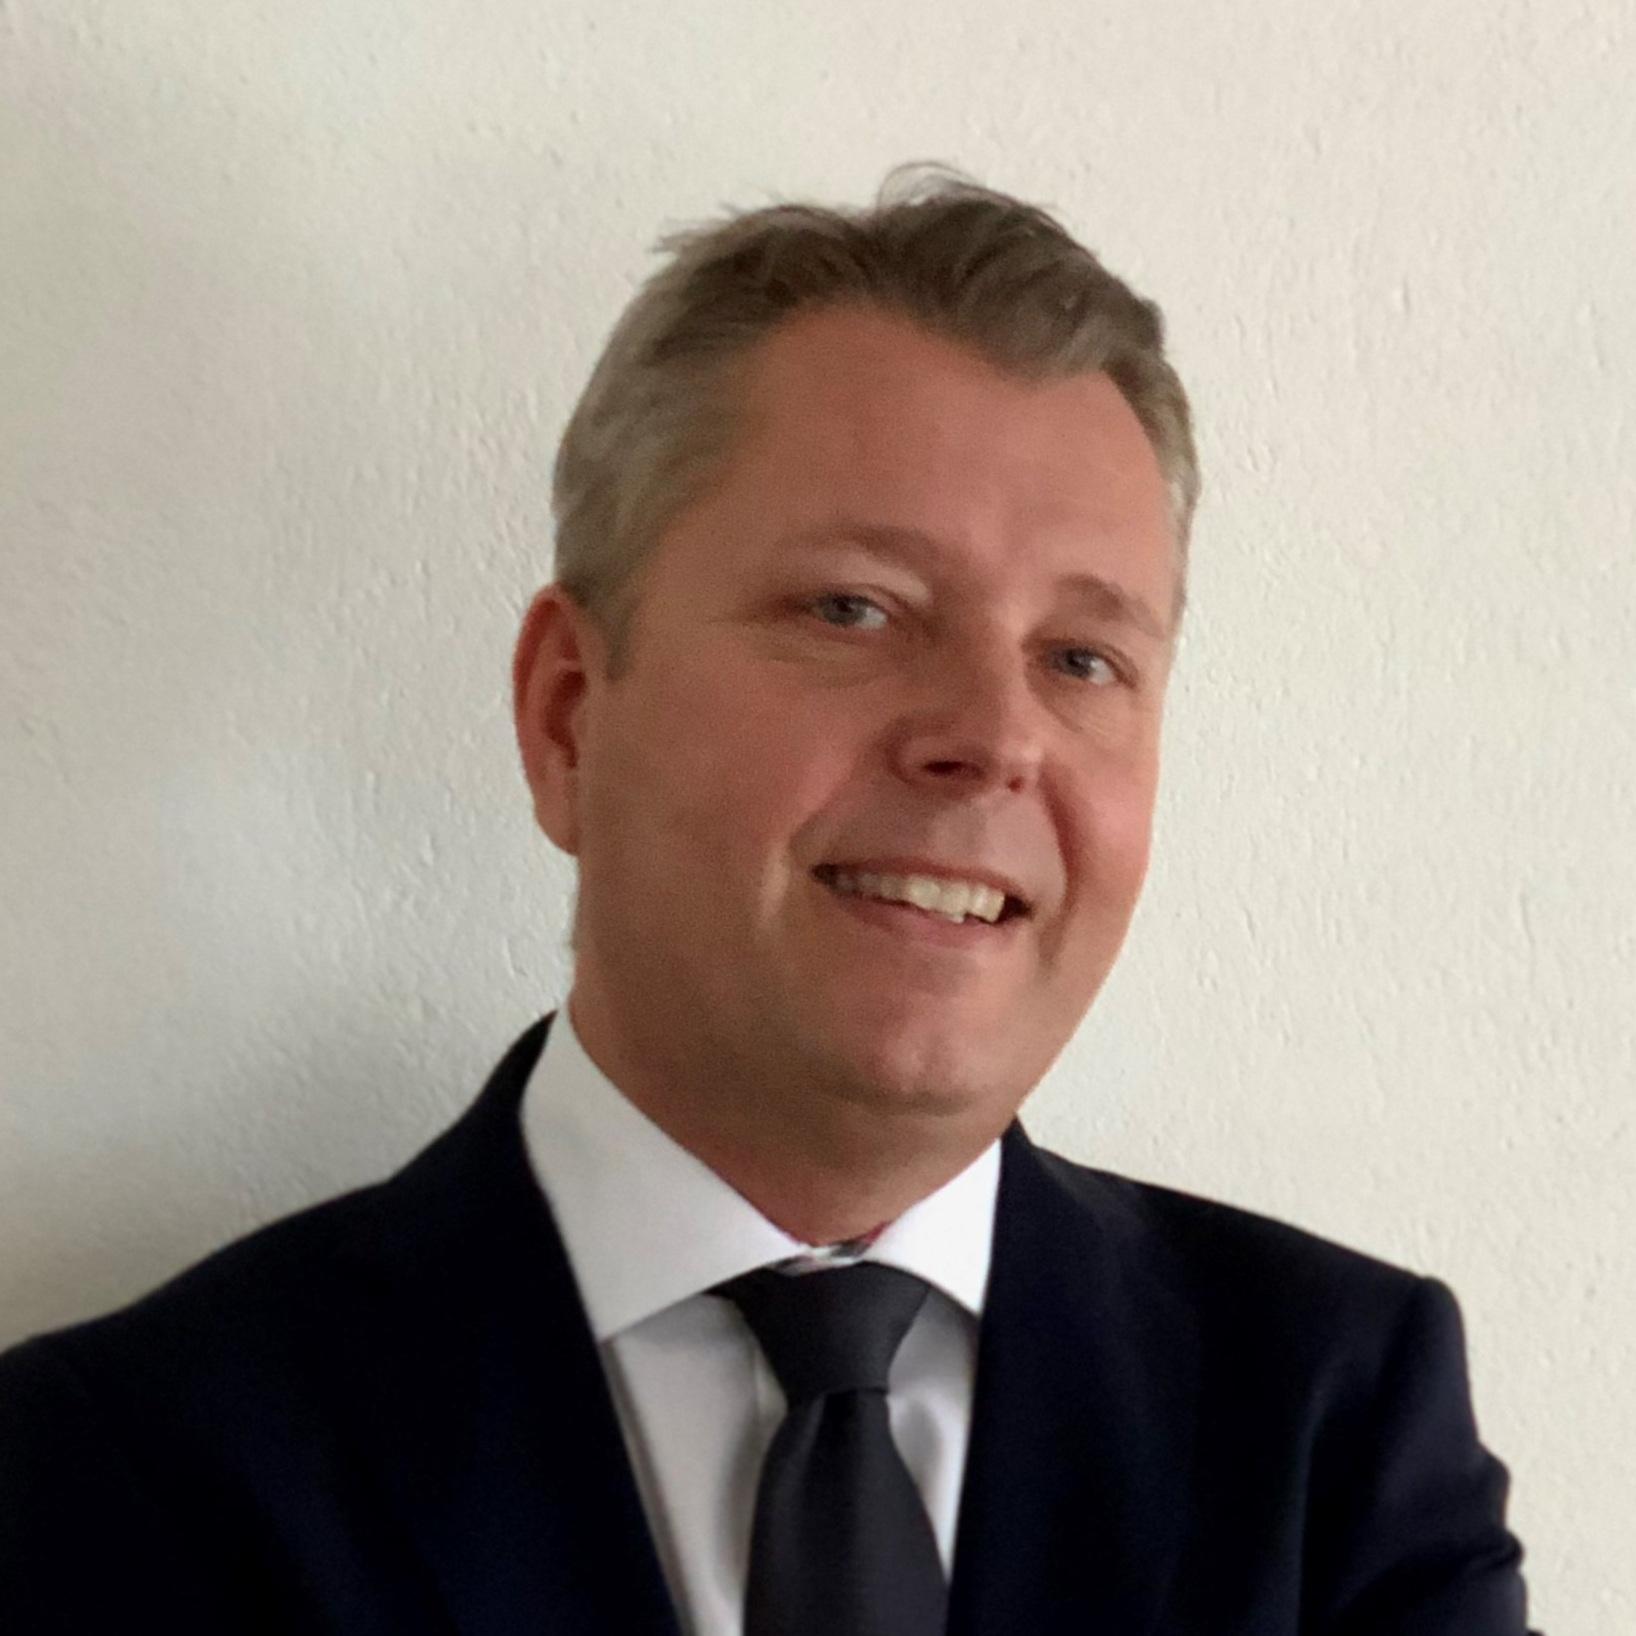 Knut Arild Fjeldvik Evensen  Styreformann   LinkedIn profil